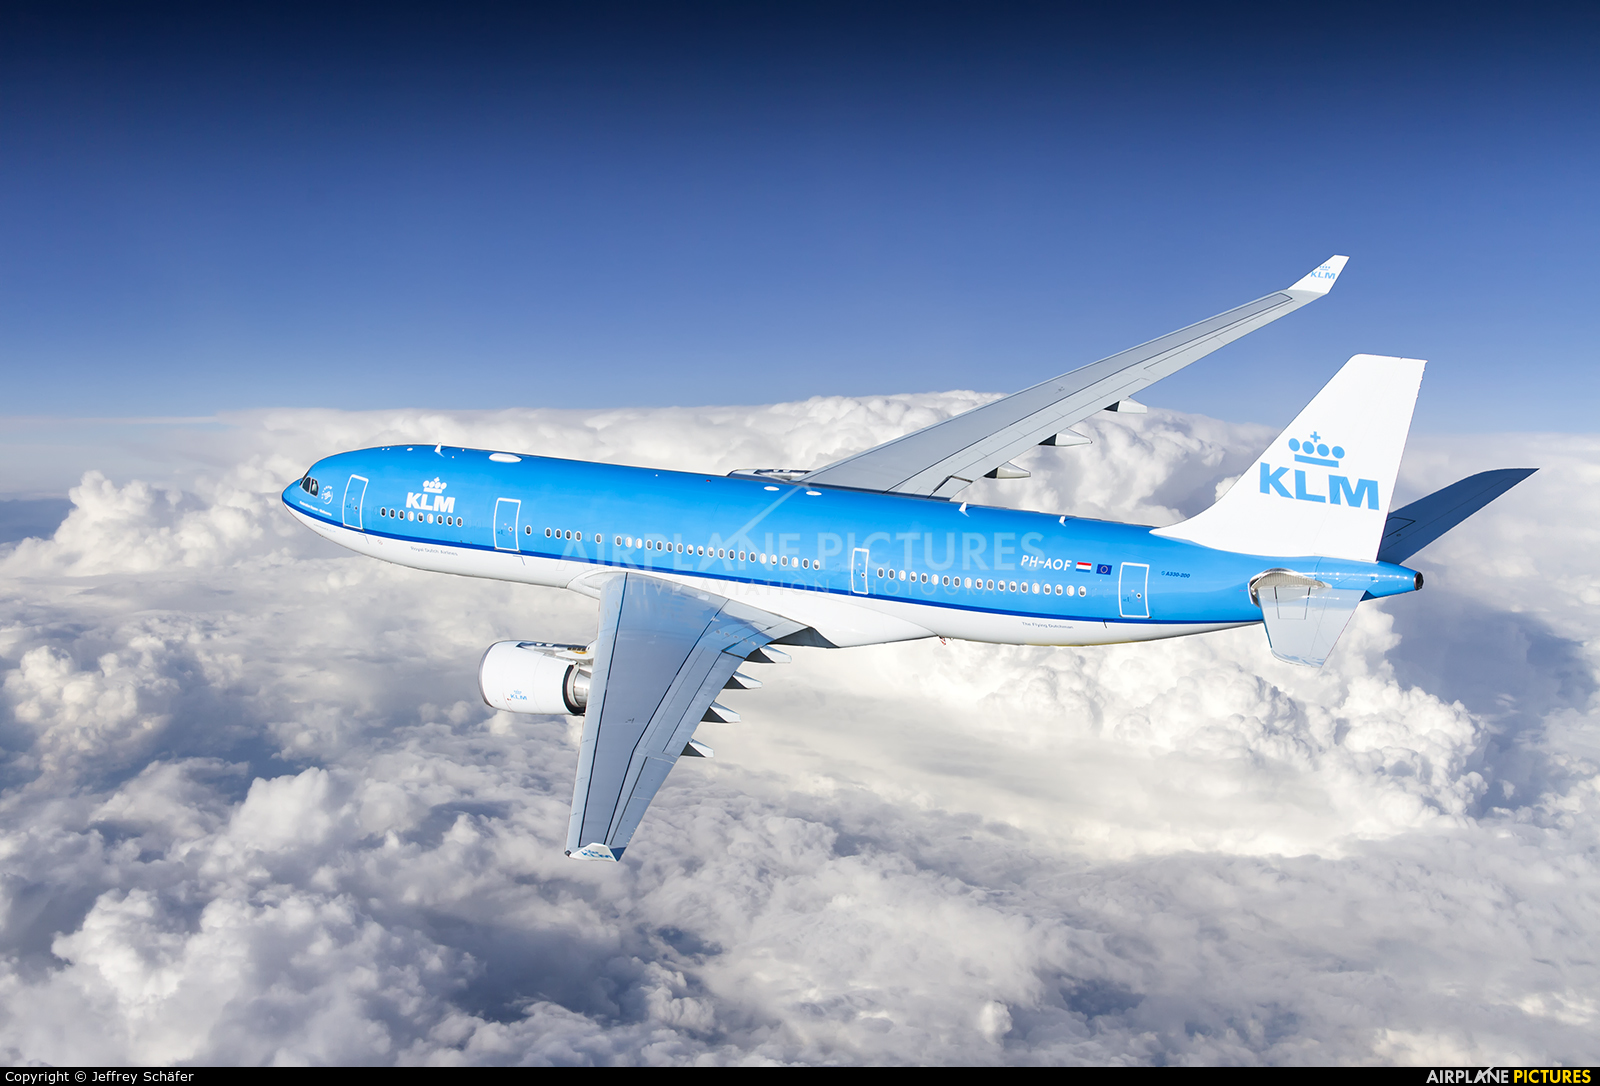 KLM PH-AOF aircraft at In Flight - International